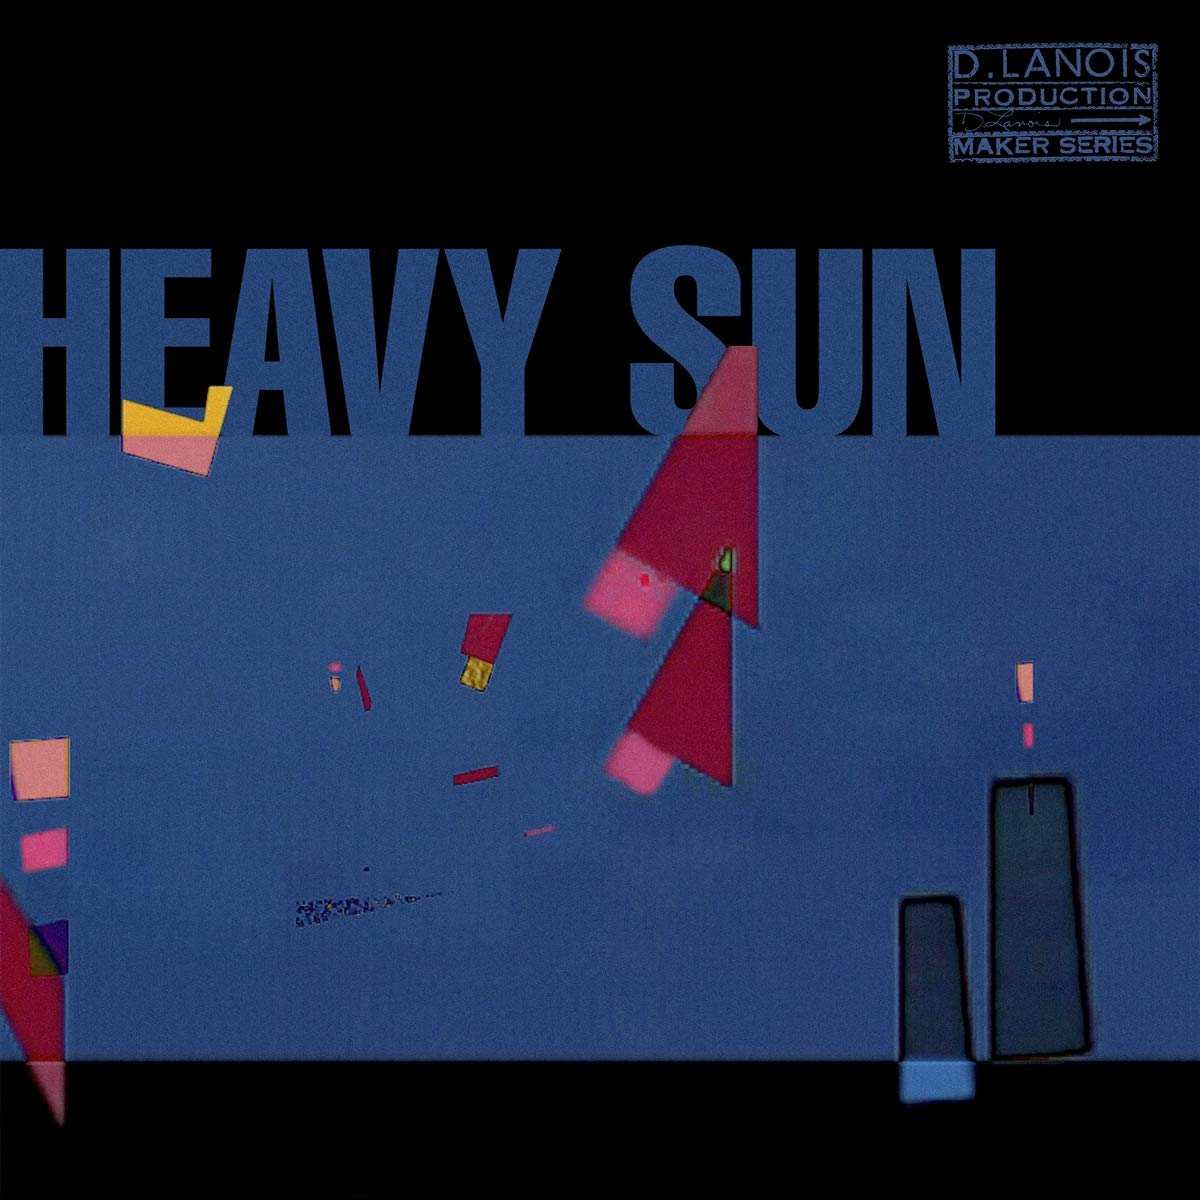 Daniel Lanois - Heavy Sun (2021) [FLAC] Download